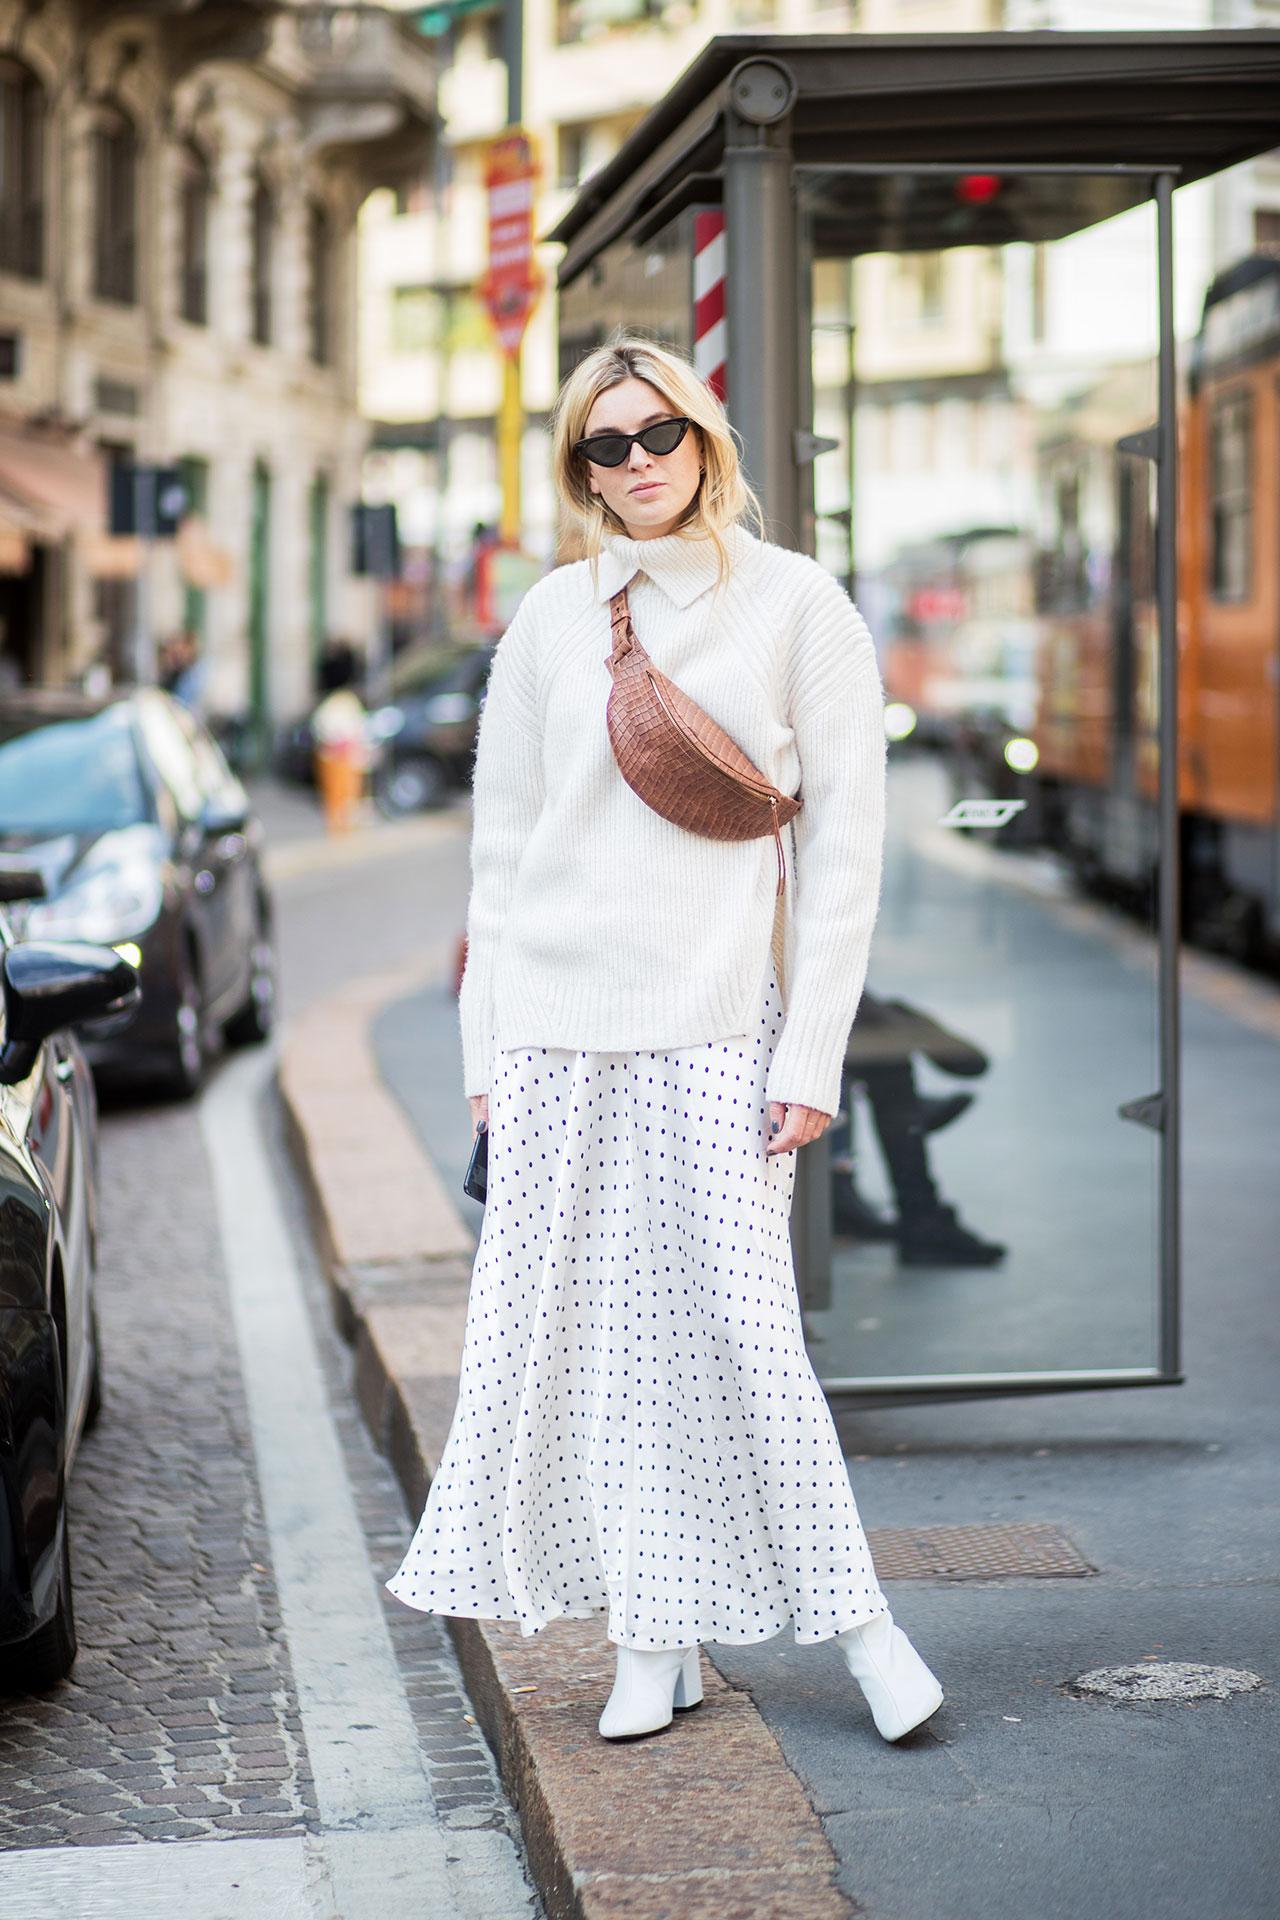 milan fashion week street style spring 2018 camille charriere white sweater white polka dot ganni dress white boots fanny pack belt bag